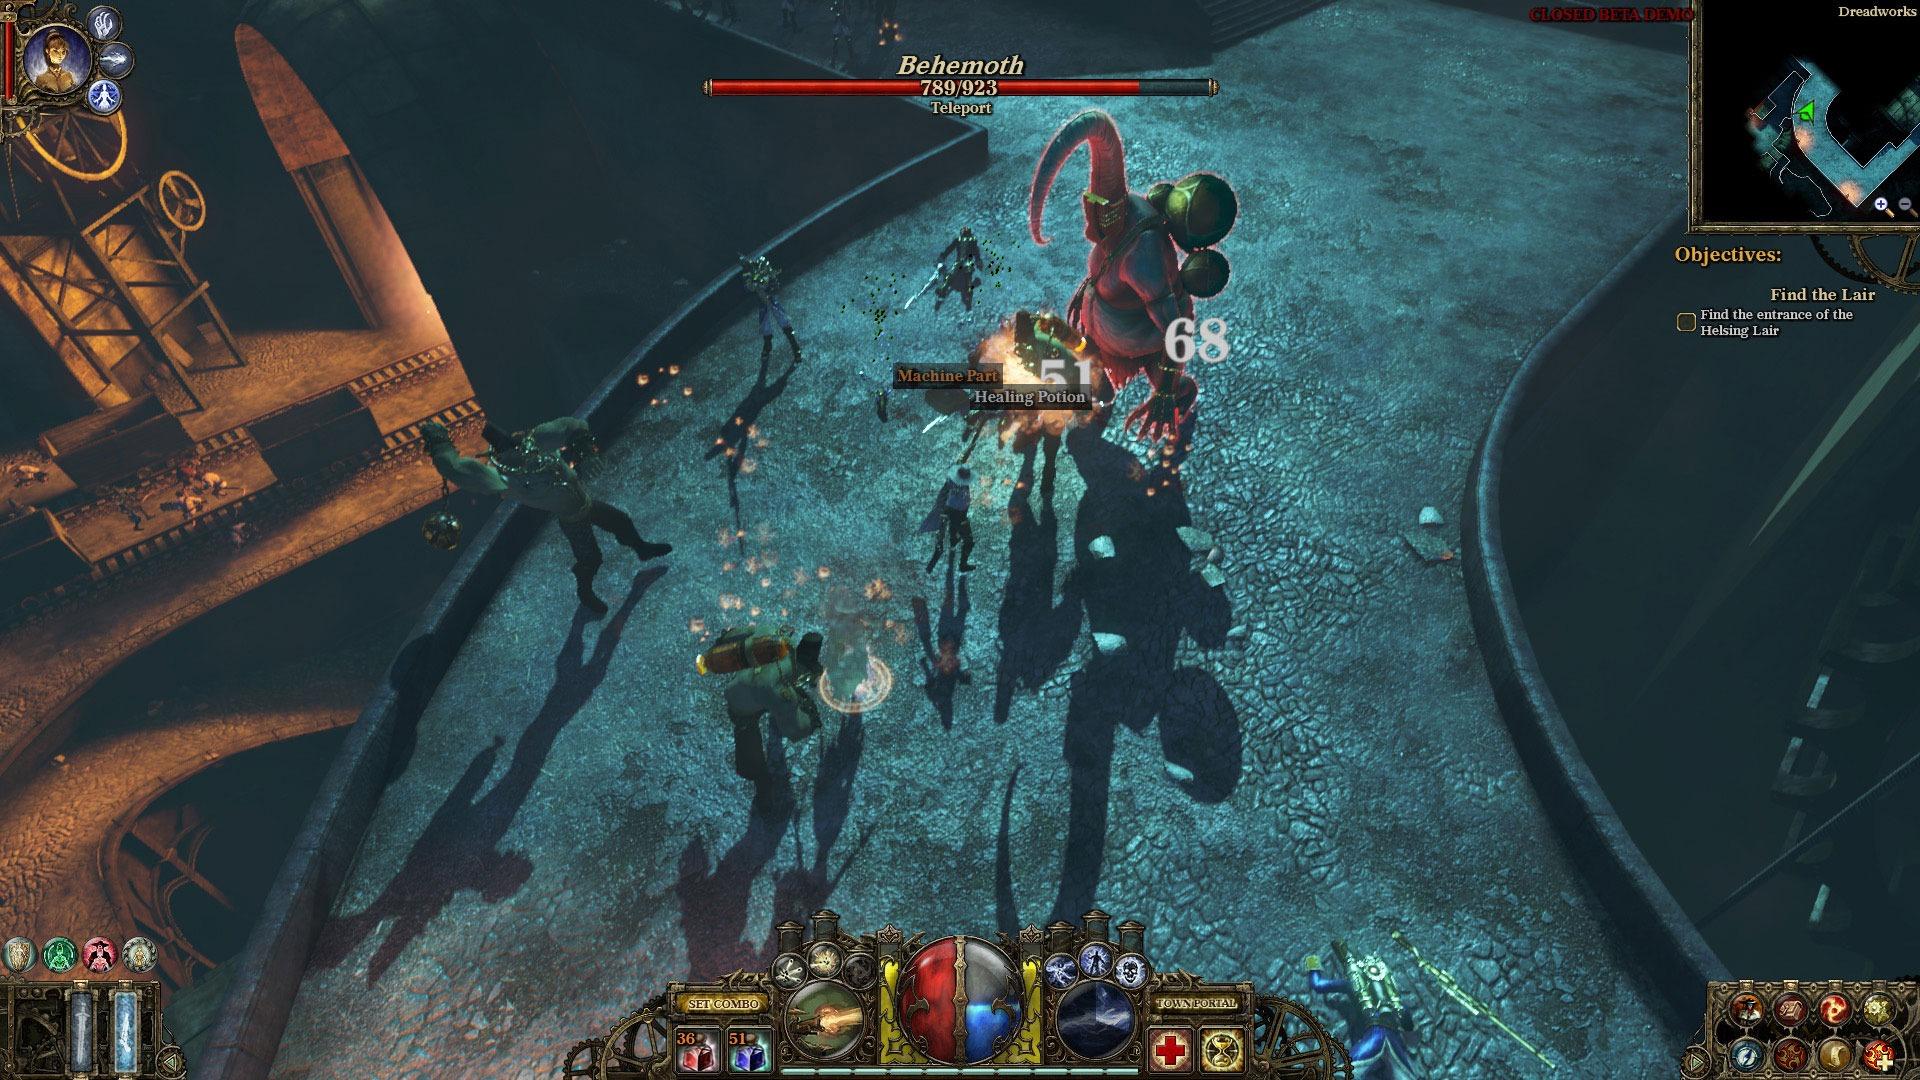 The Incredible Adventures of Van Helsing screenshot